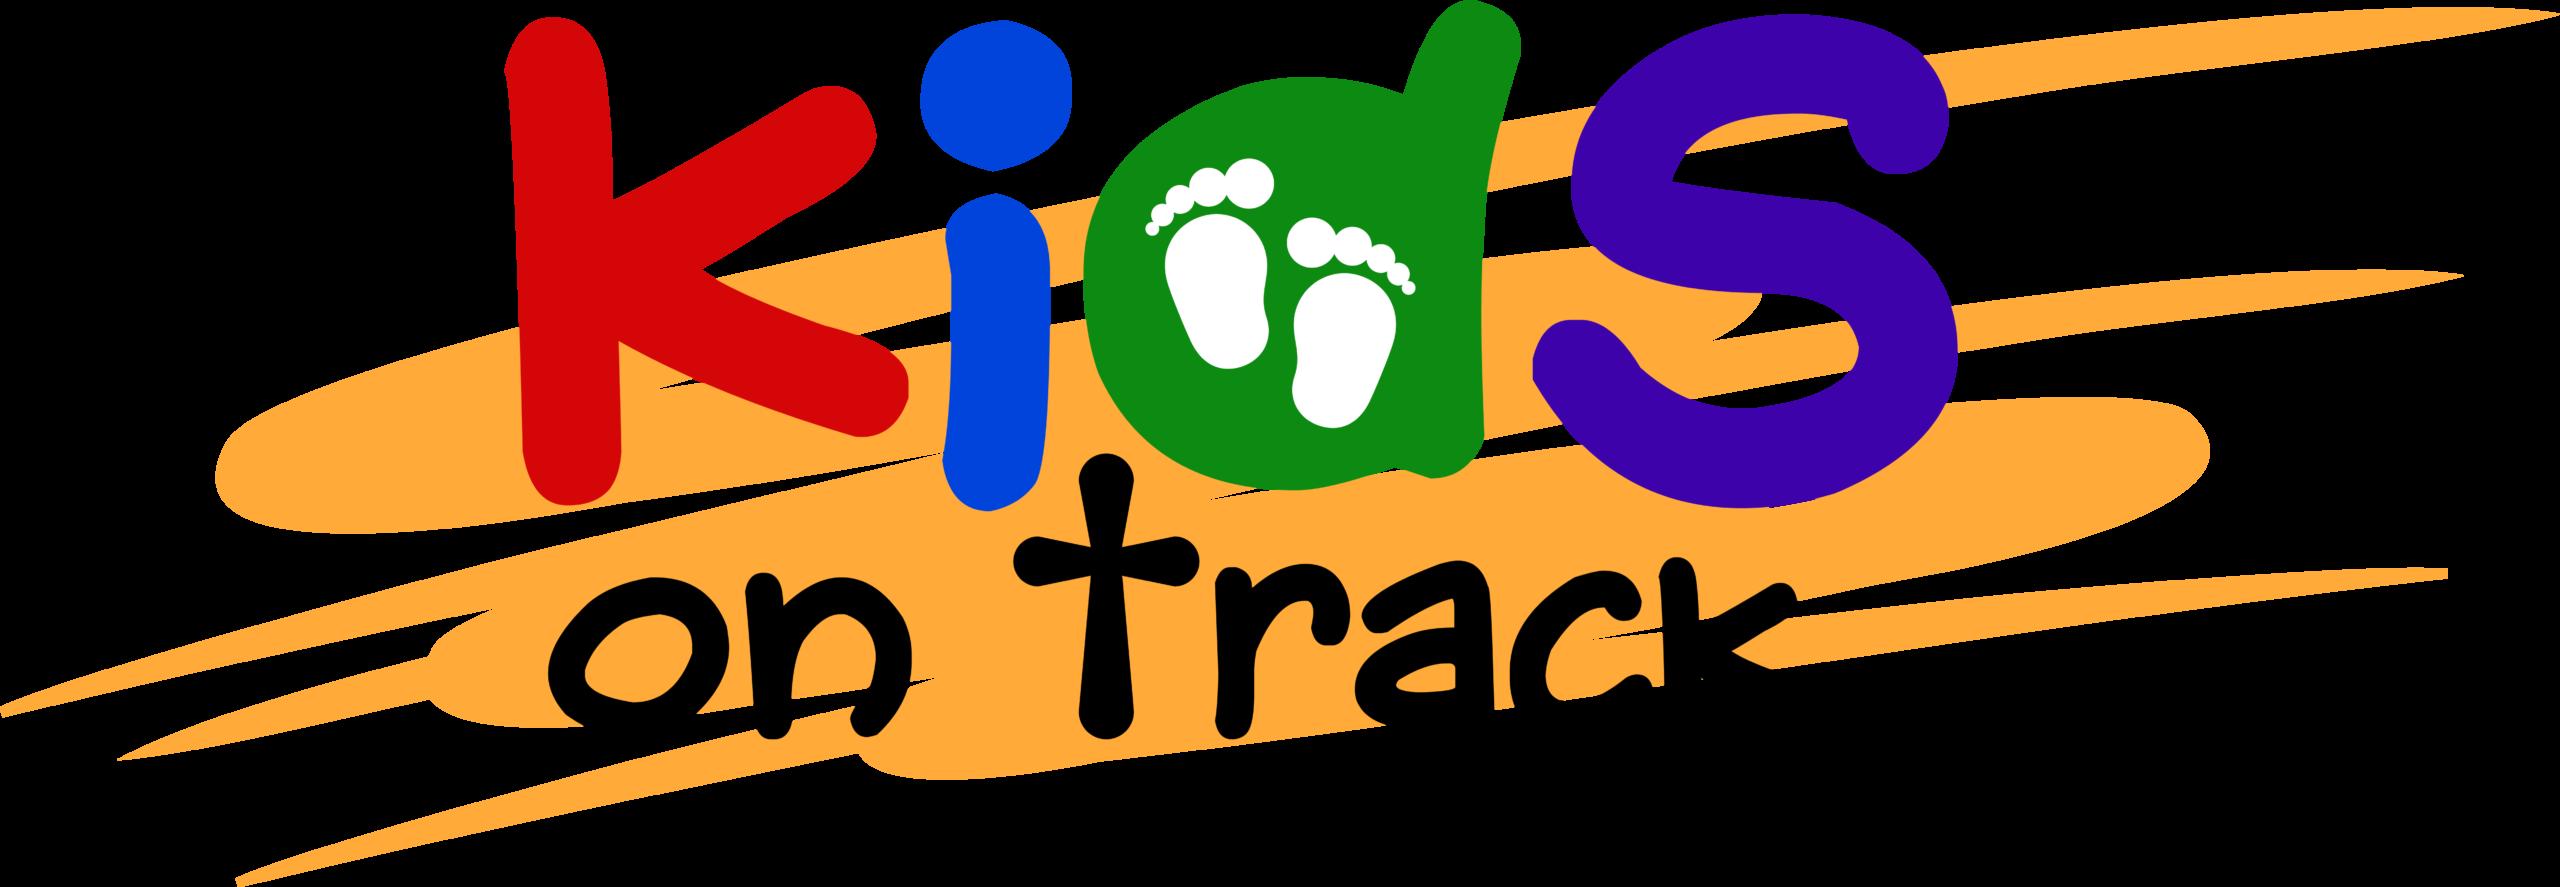 Kids on track Kids Church of Crossroads Fellowship Nyali Mombasa Kenya